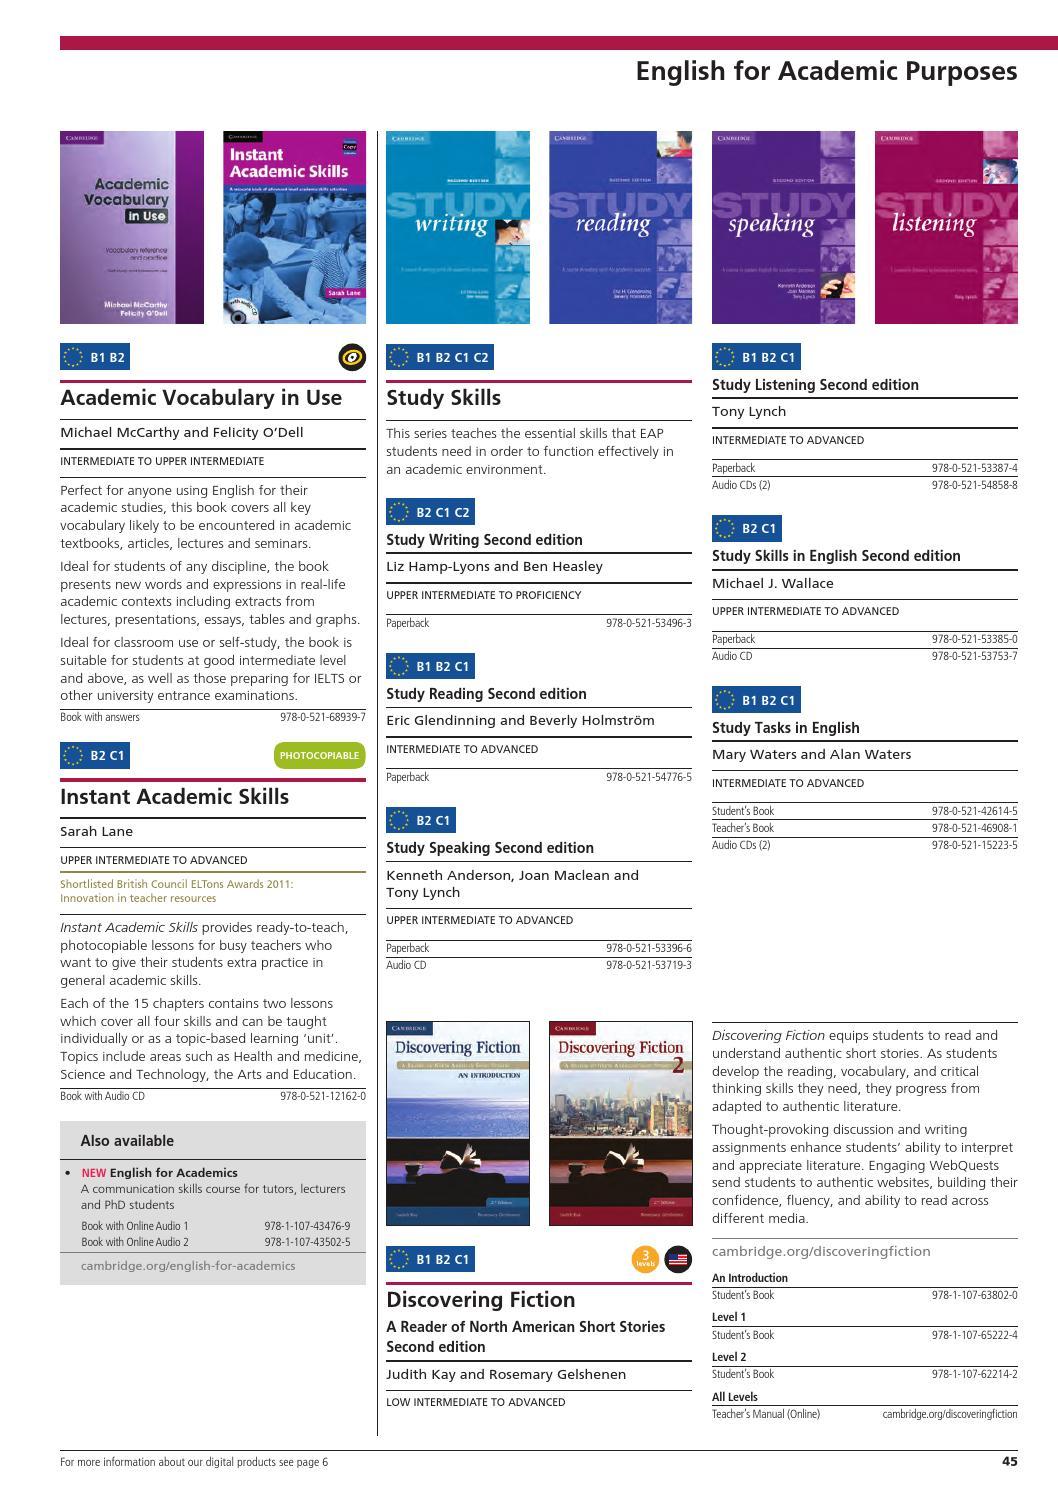 english for academic purposes essay topics